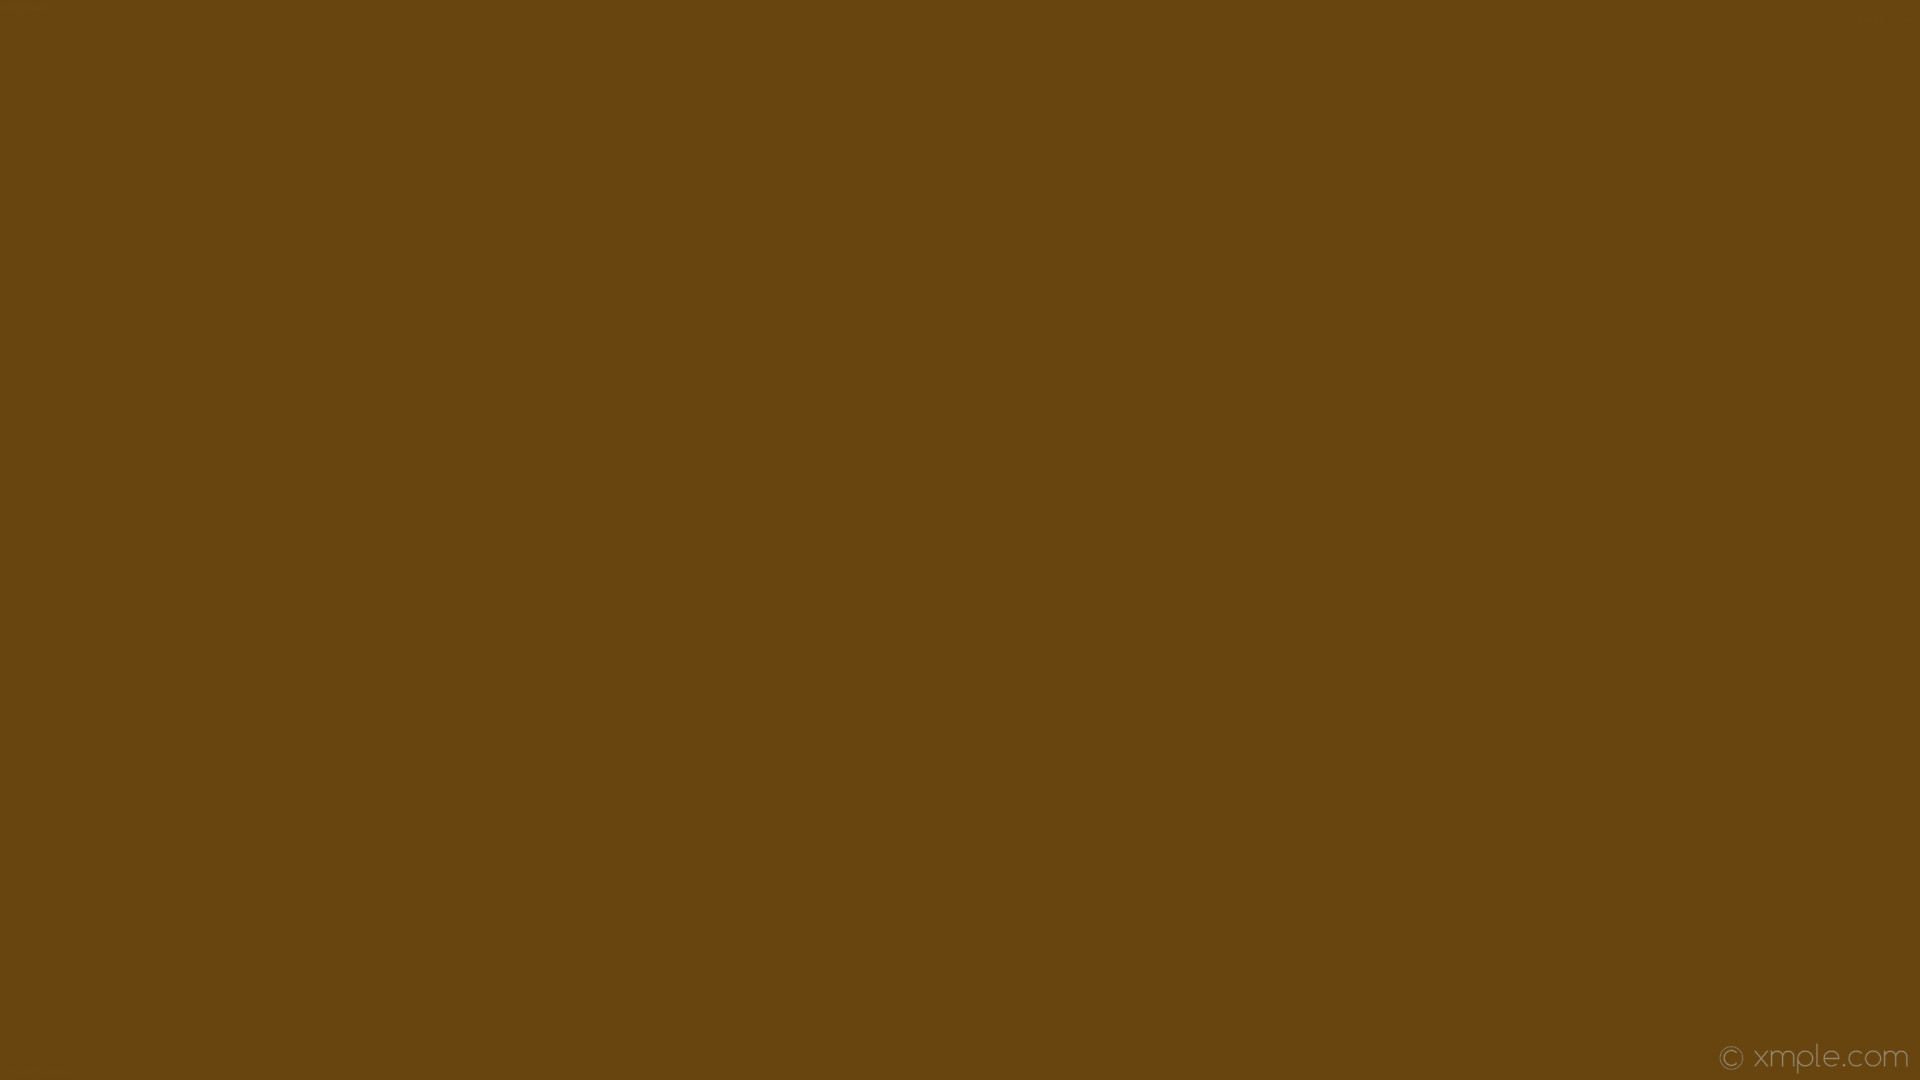 wallpaper solid color one colour orange single plain #68450e